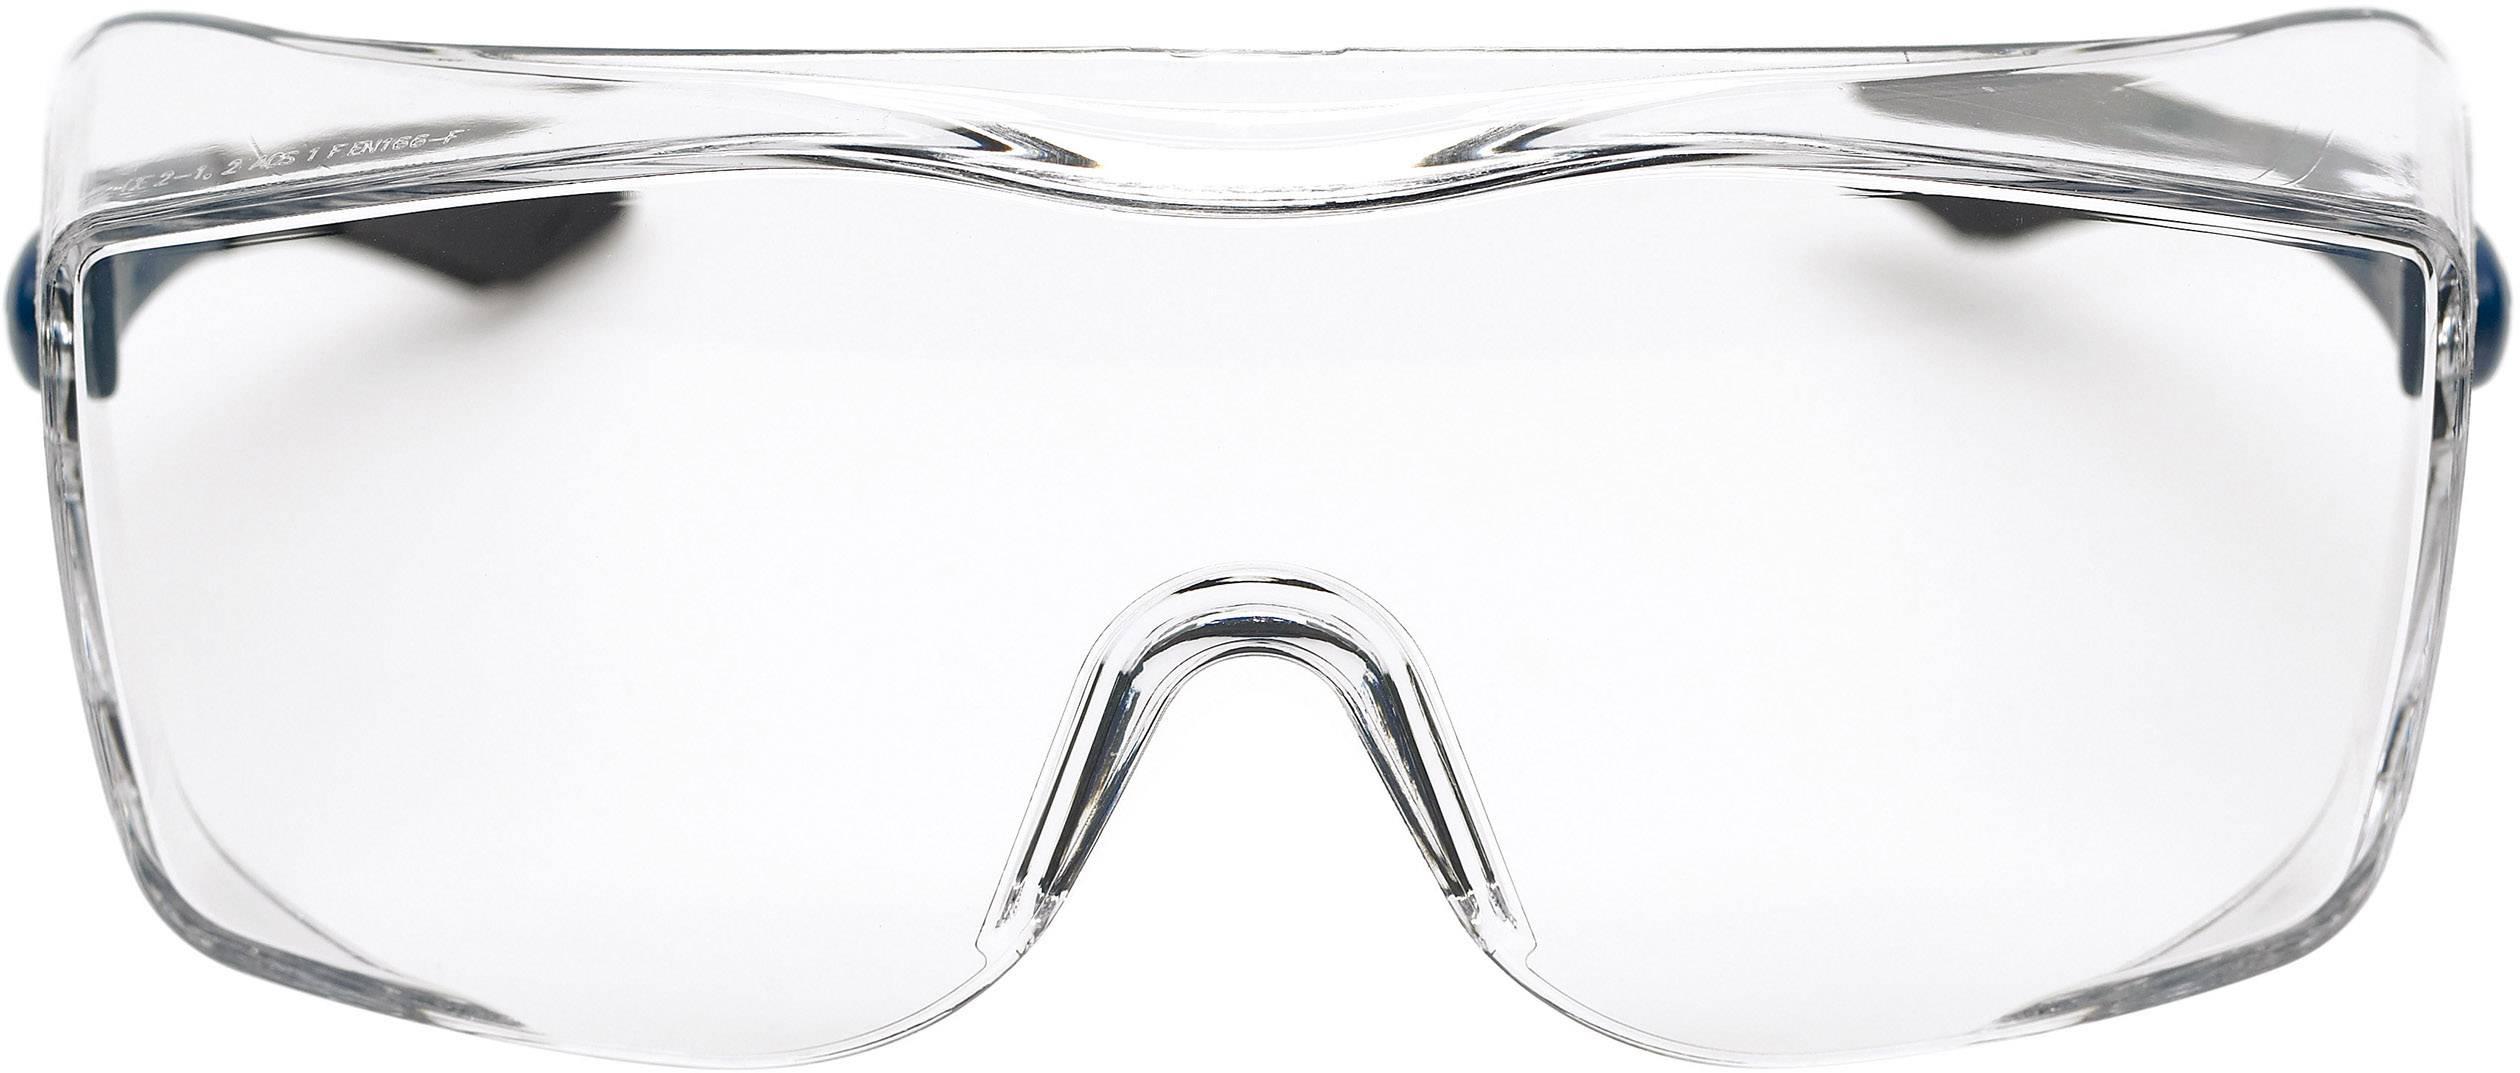 Populair 3M 17-5118-3040 Veiligheidsbril Blauw, Zwart DIN EN 166-1   Conrad.nl NC53